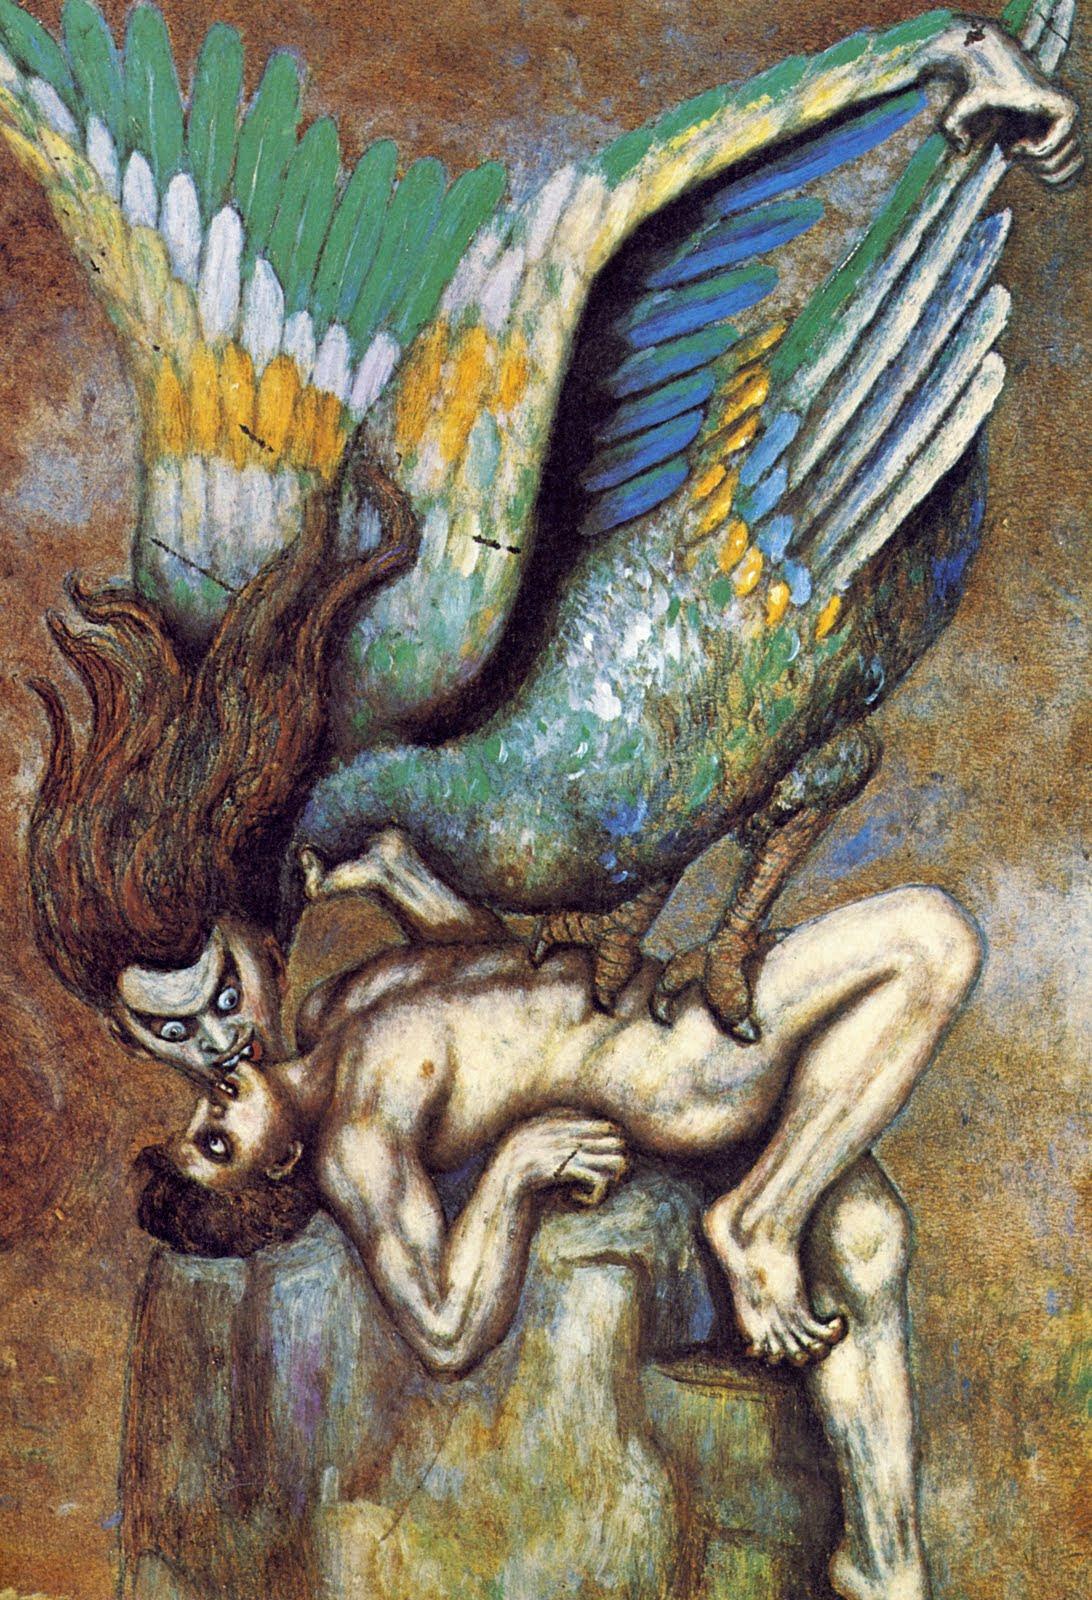 Boleslaw Biegas - Kiss of the Vampire, 1916